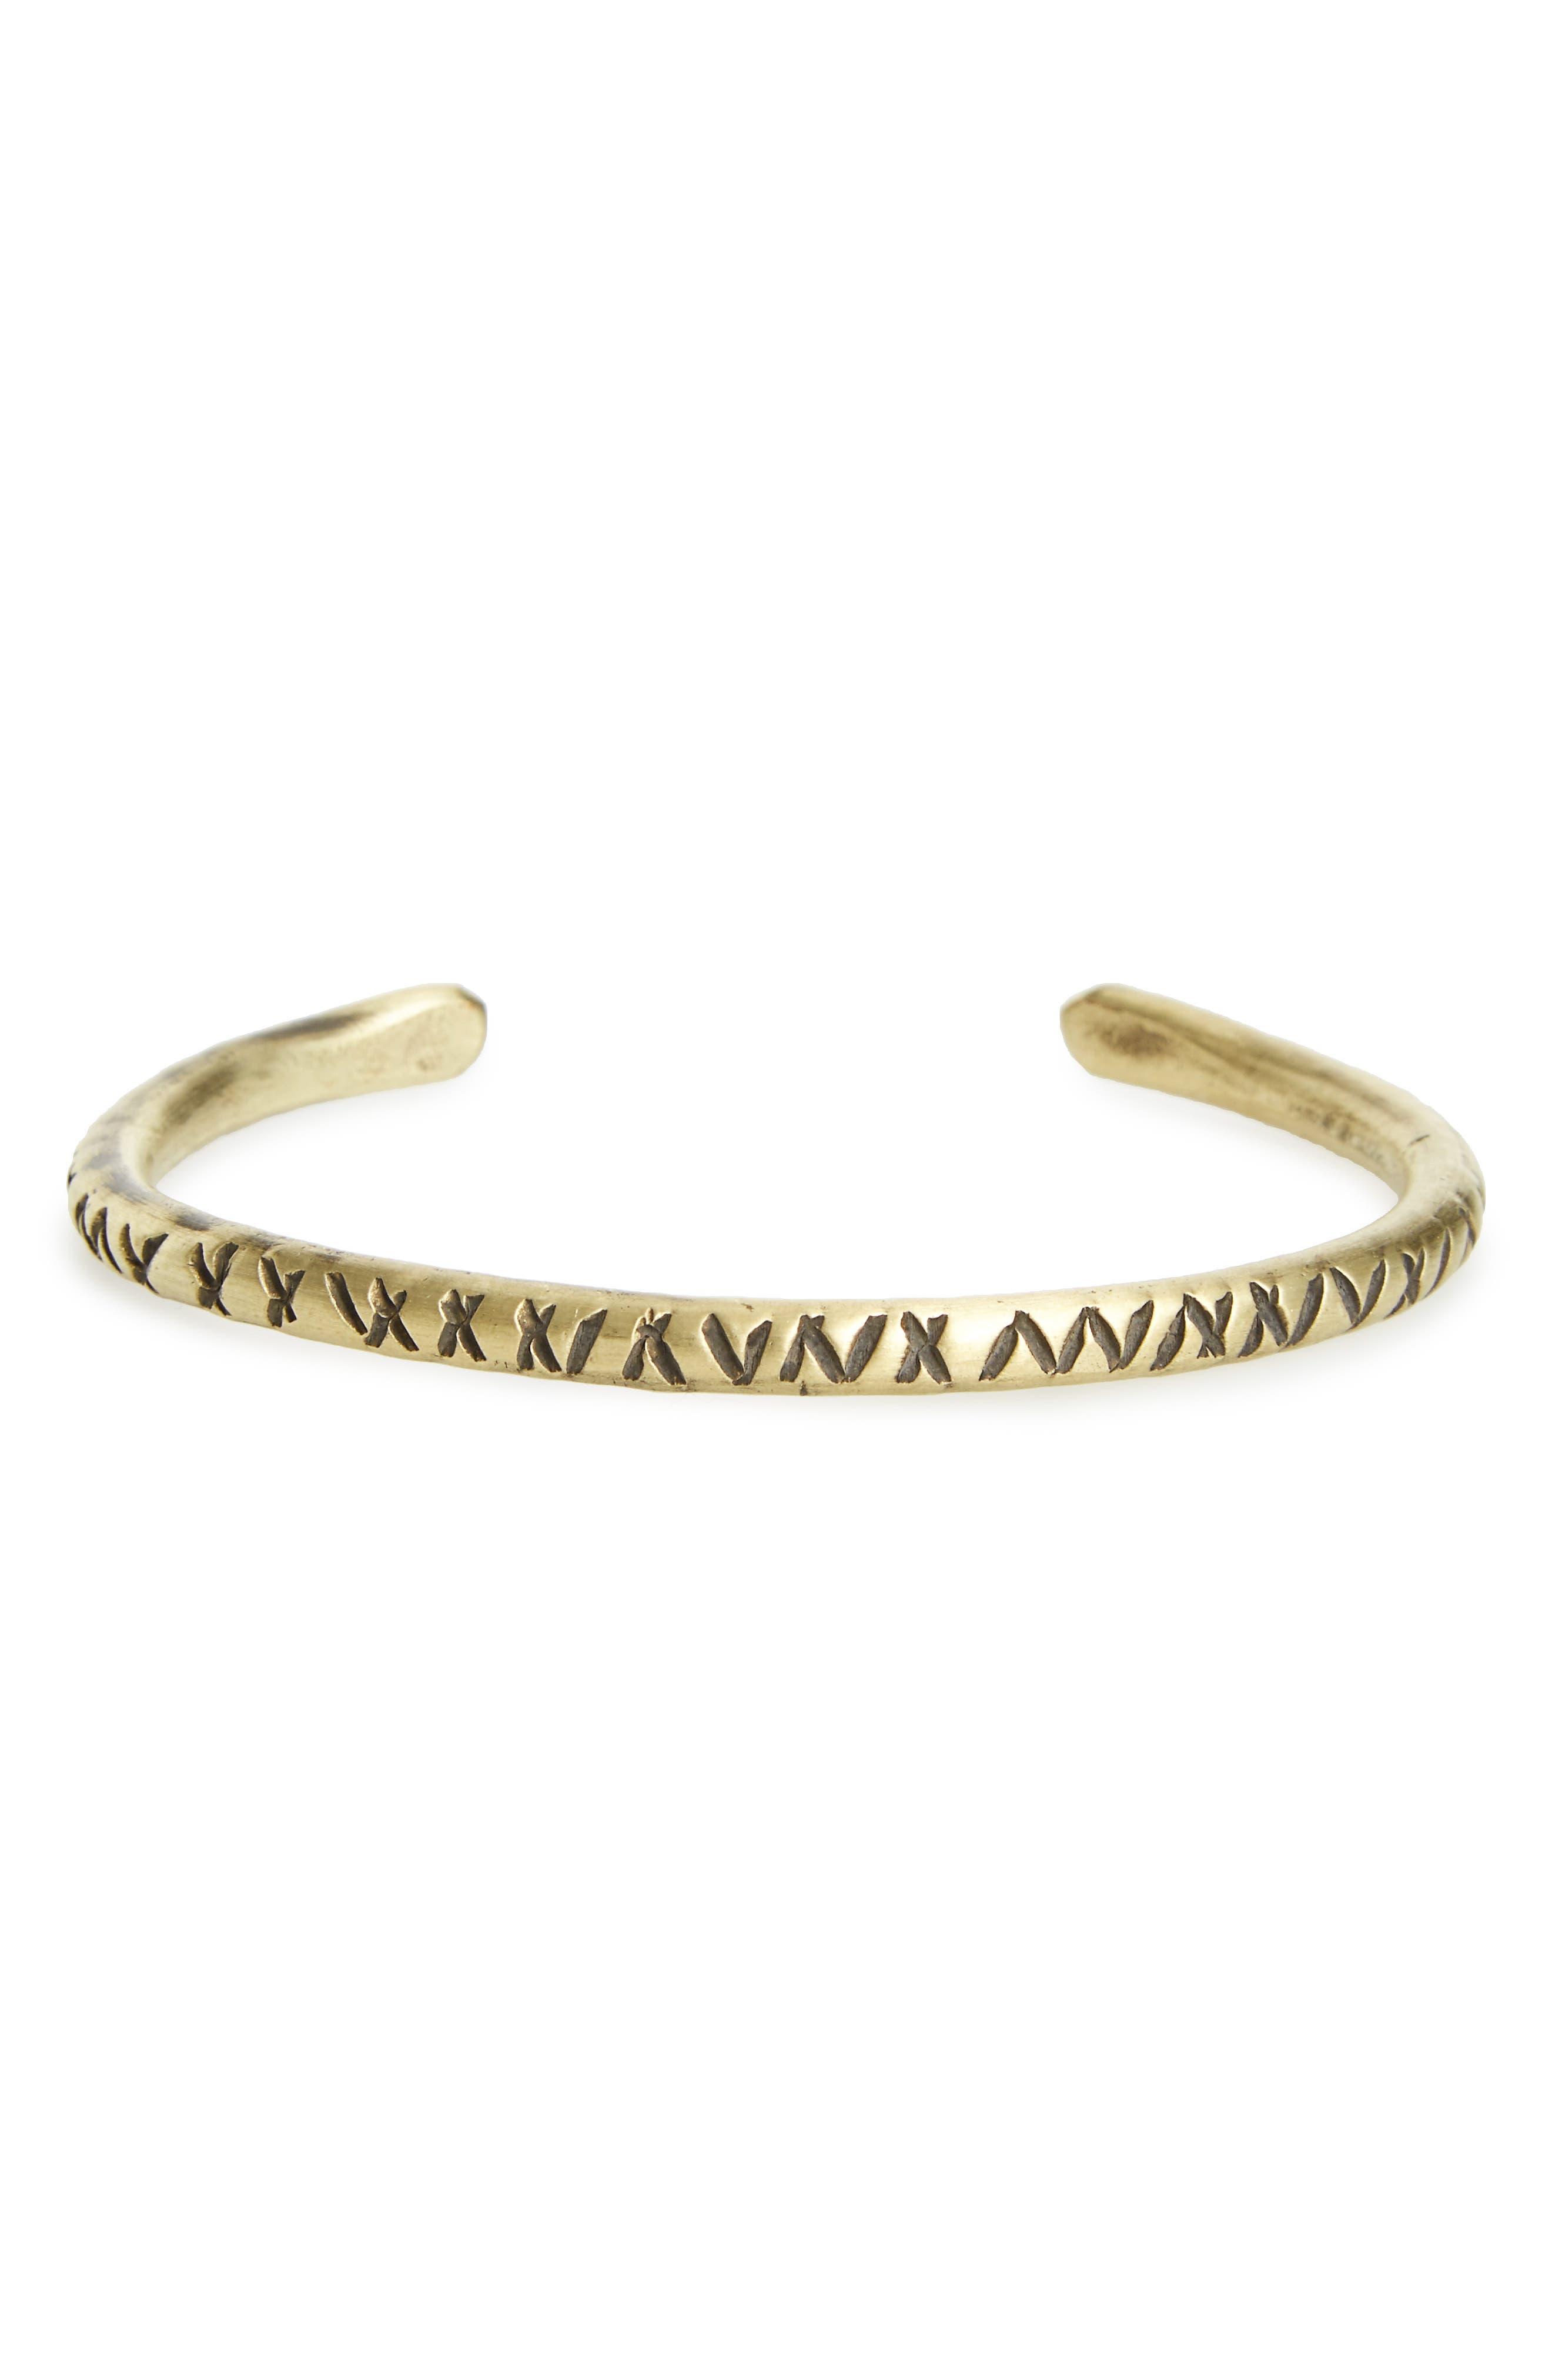 Alternate Image 1 Selected - Cause & Effect Brass Cuff Bracelet